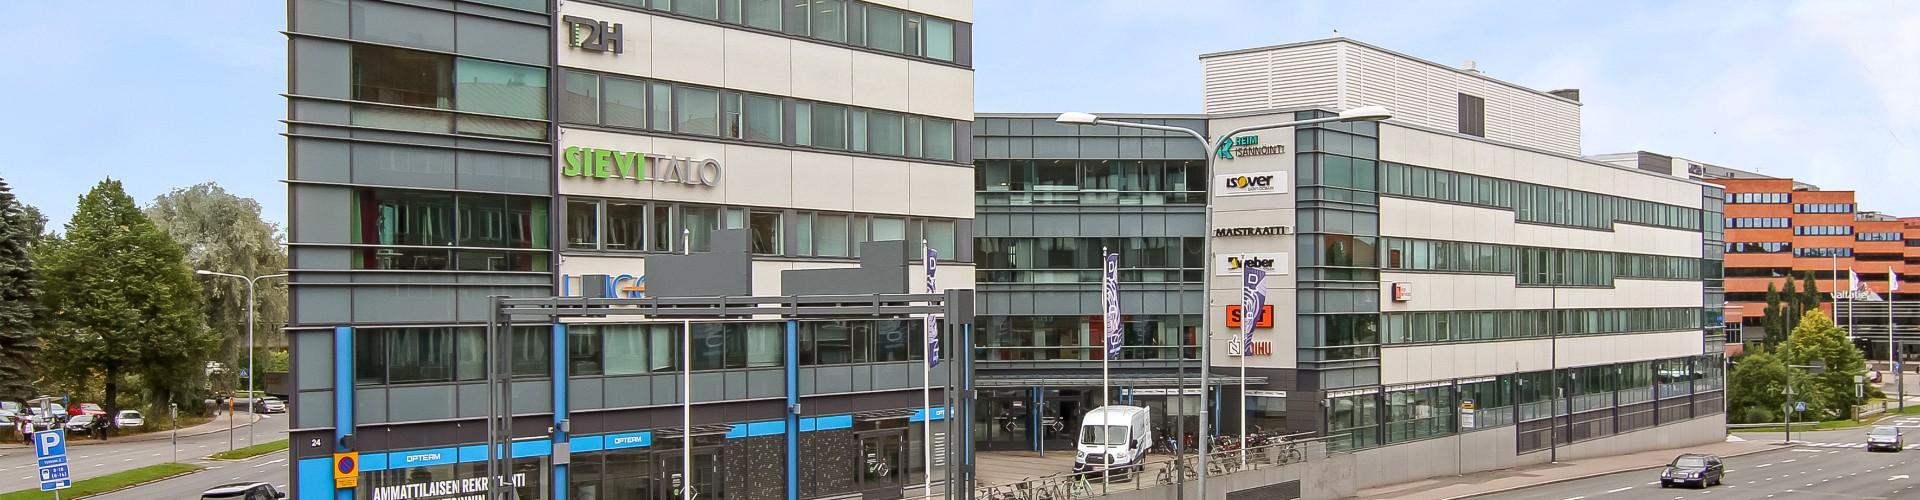 Dynamo Business Park